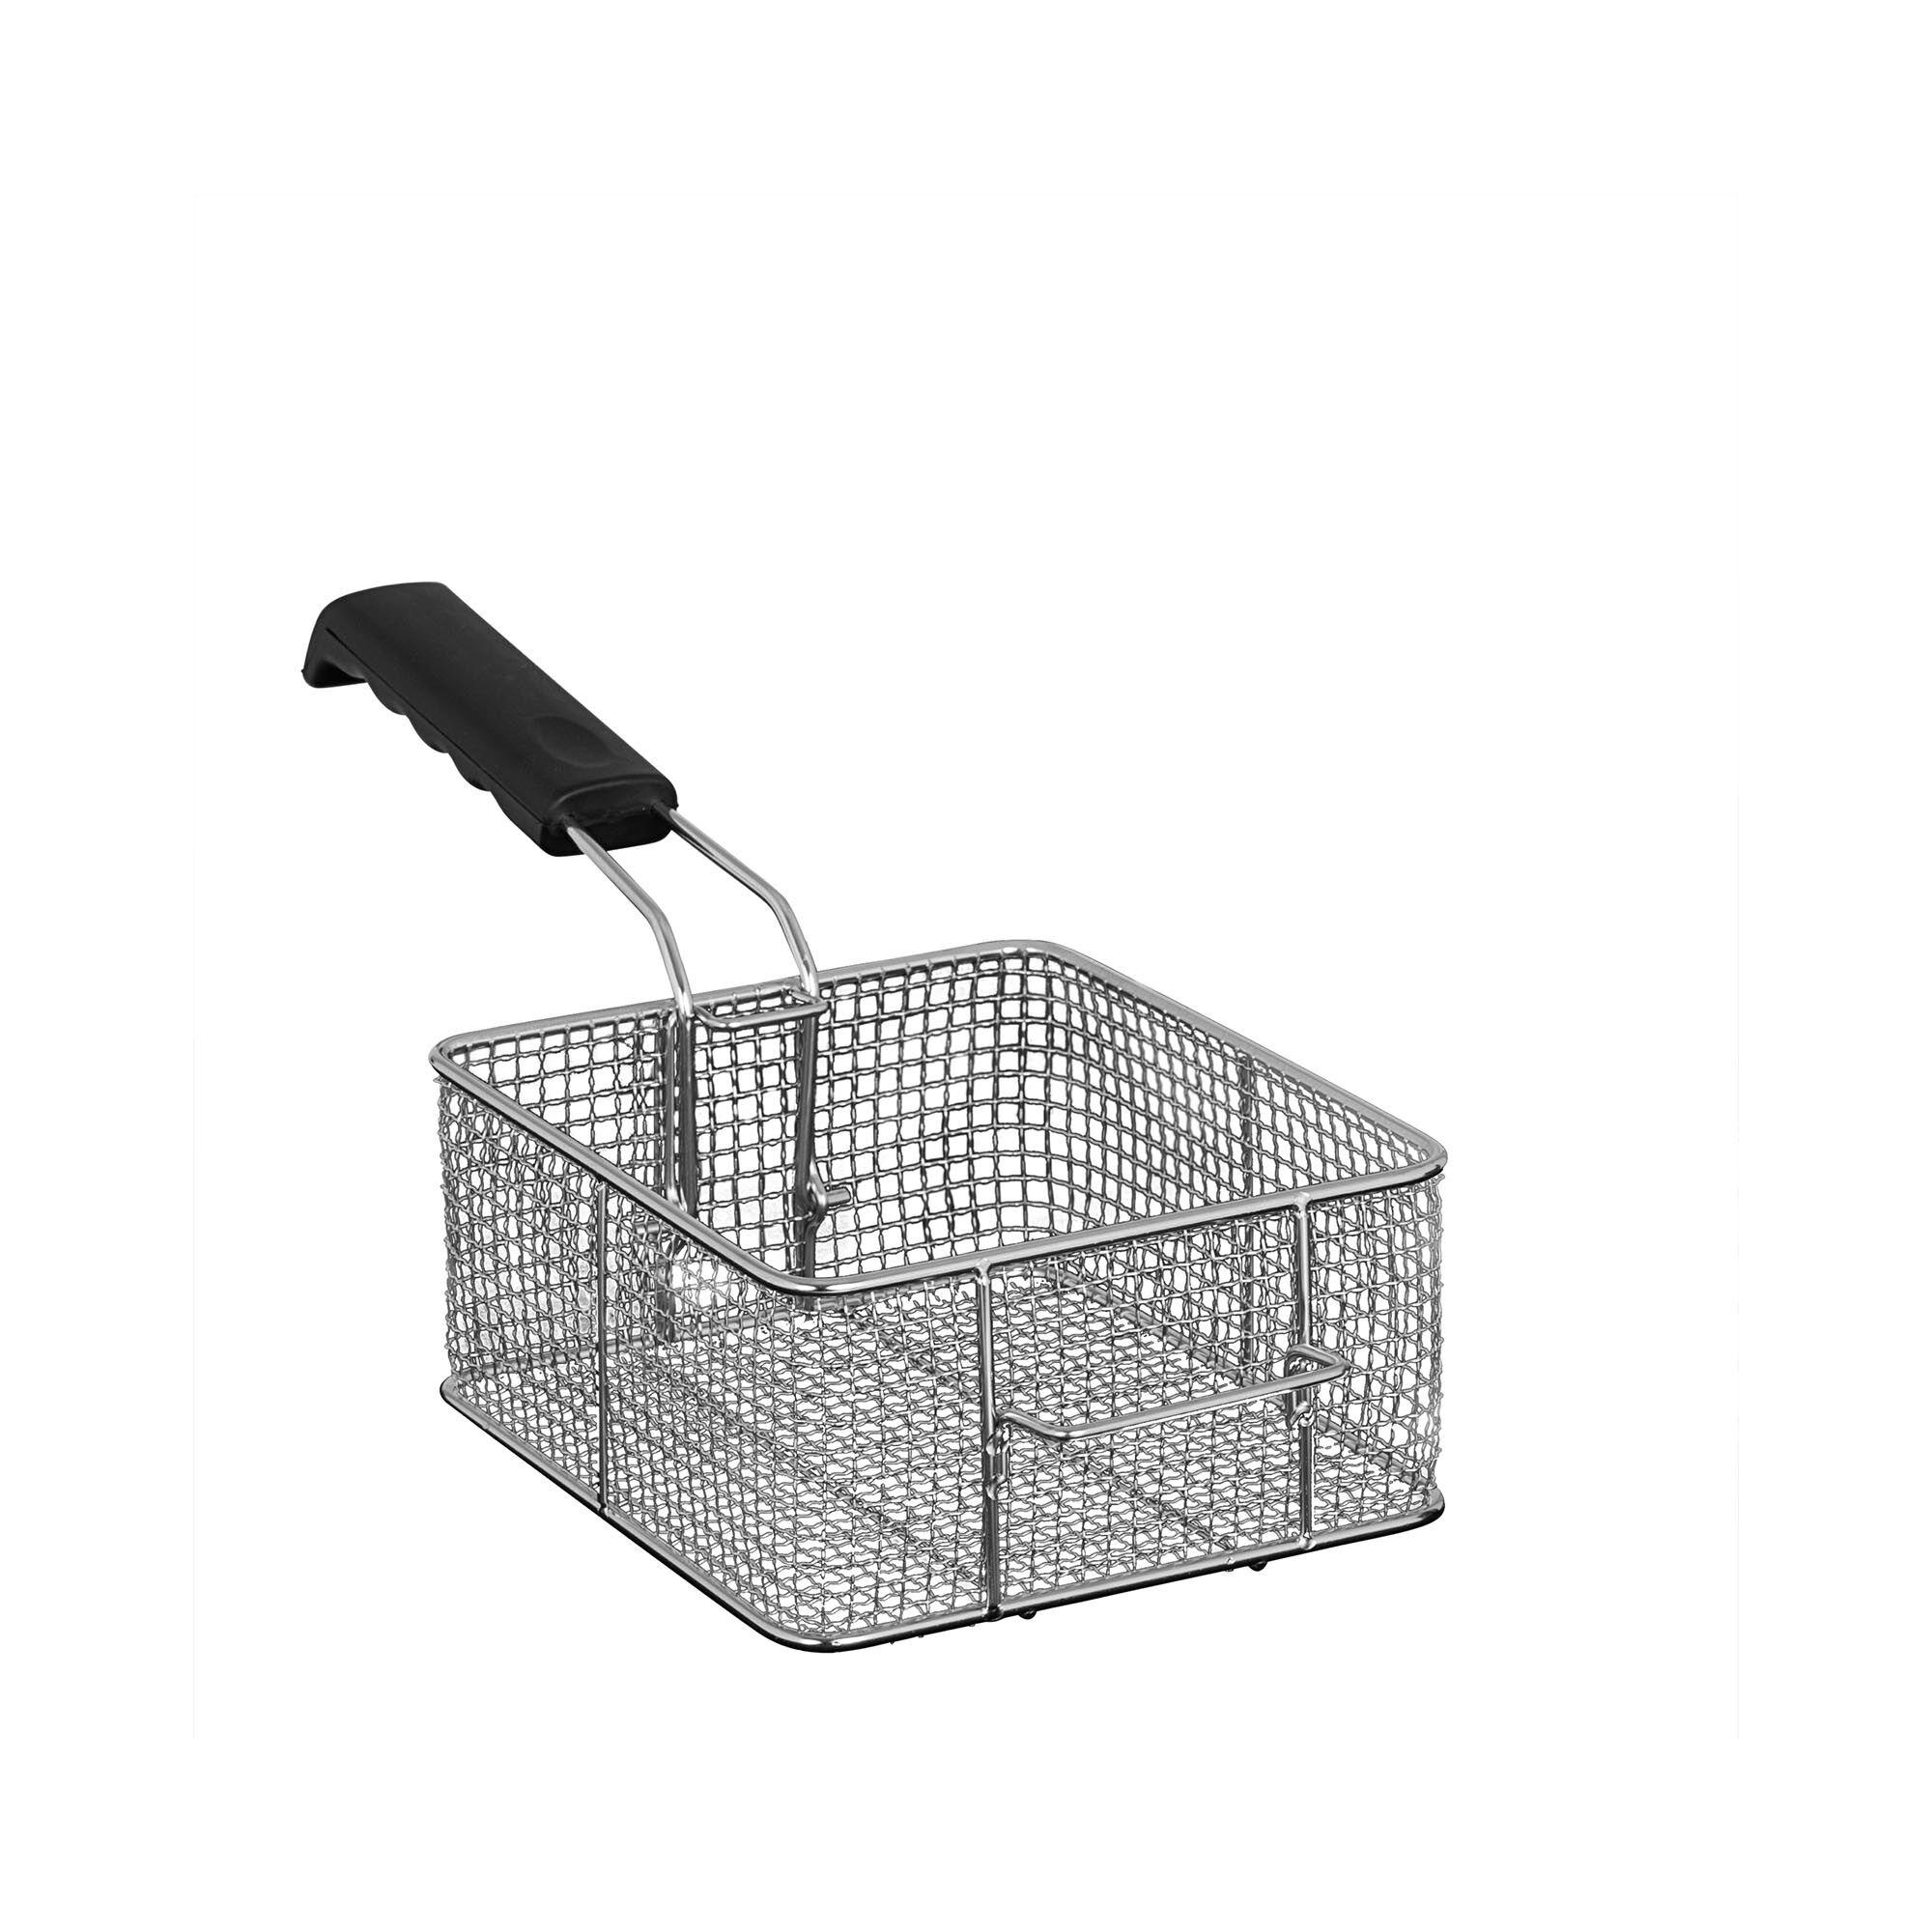 Royal Catering Panier de friteuse - 10 litres RCEF-10 all models / Fryer Basket + handle / Korb + Griff / 50835 + 50078